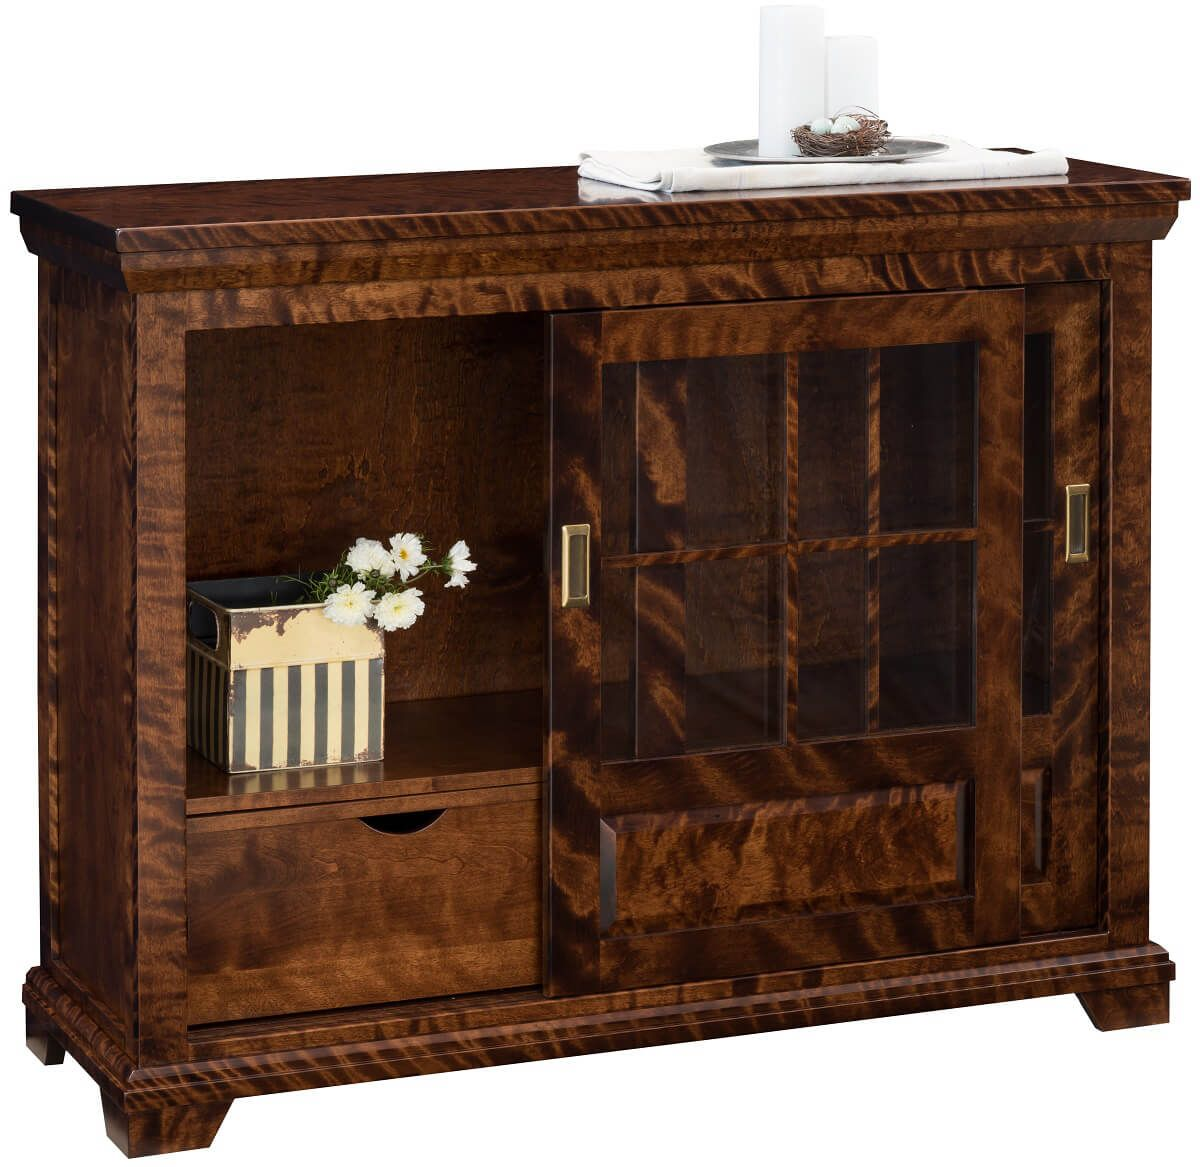 Borah Display Bookcase